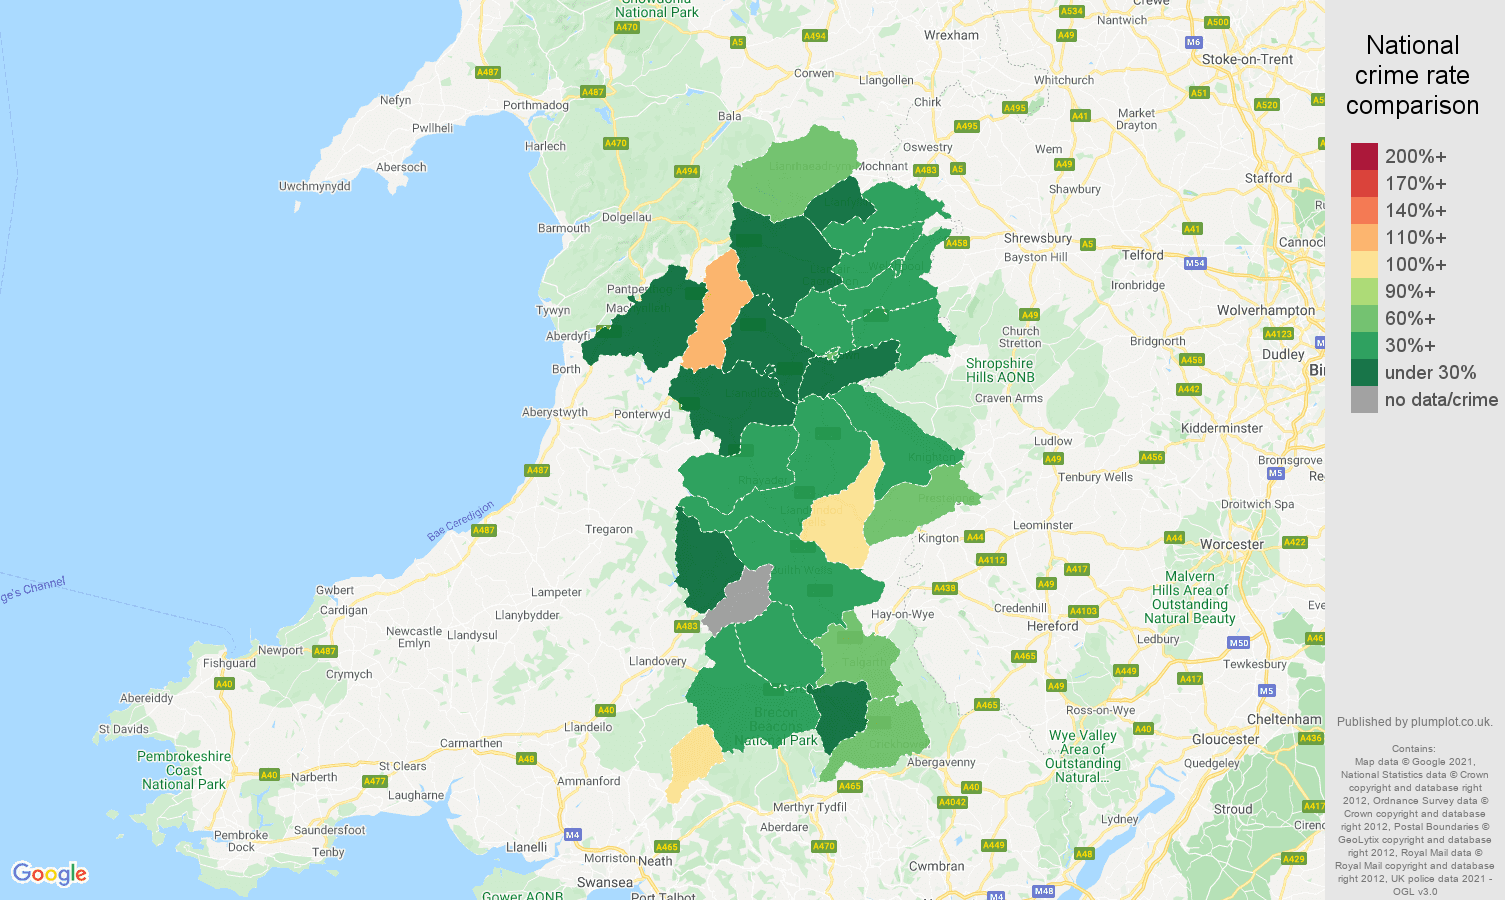 Powys burglary crime rate comparison map